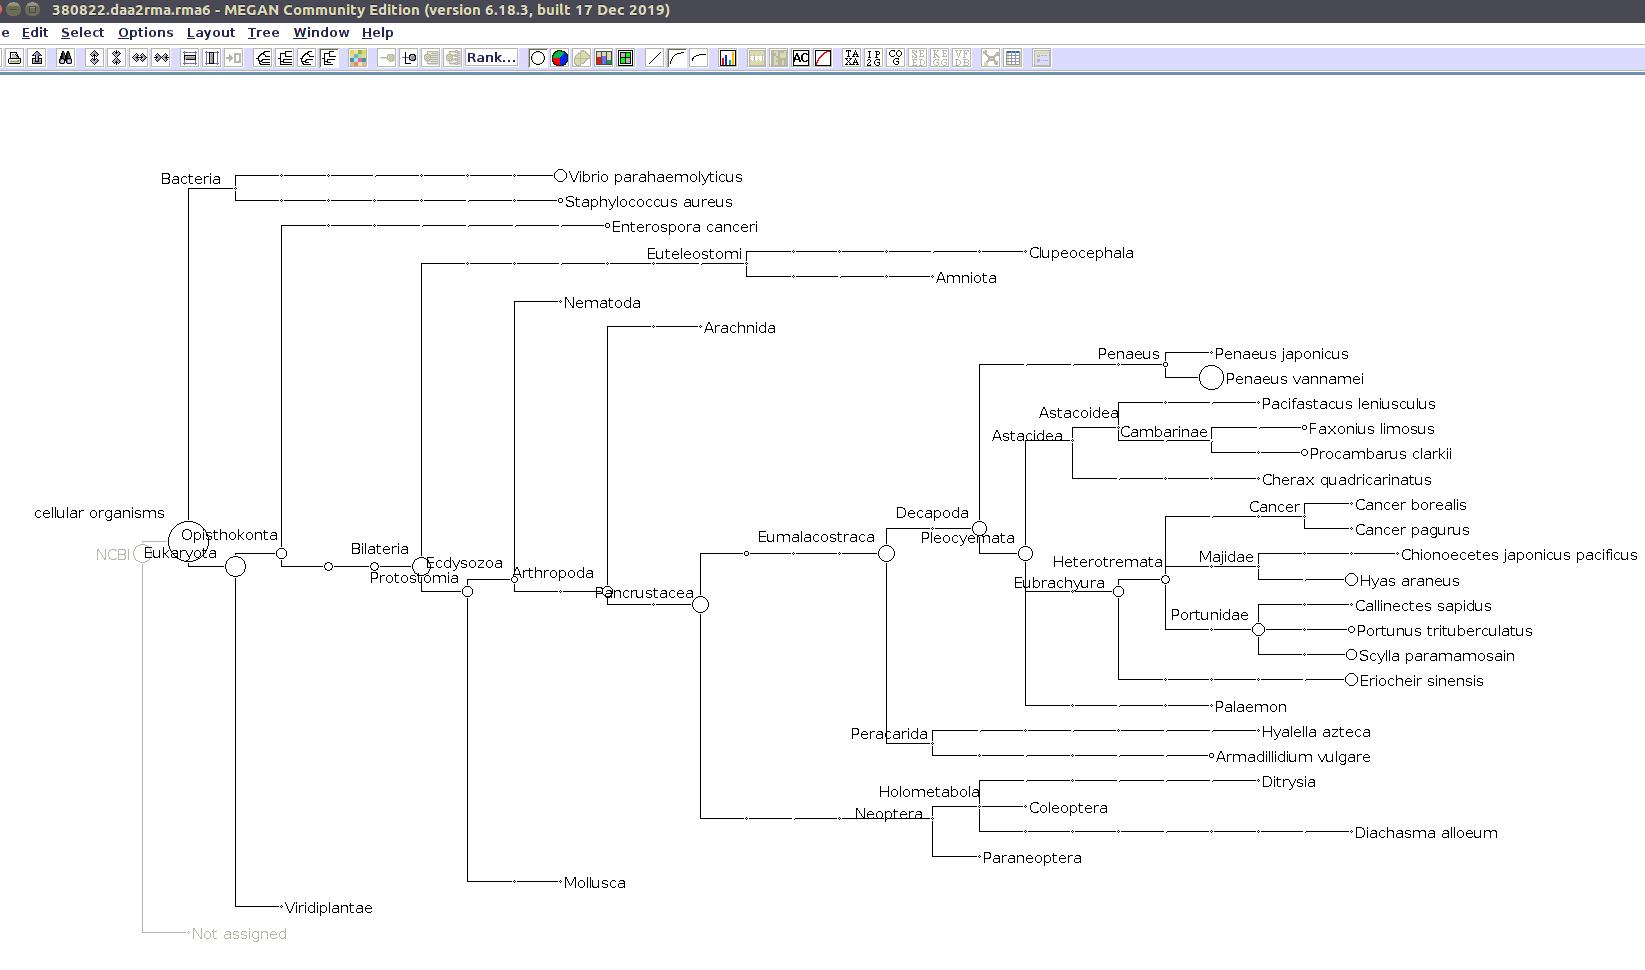 (MEGAN taxonomic tree for 380822